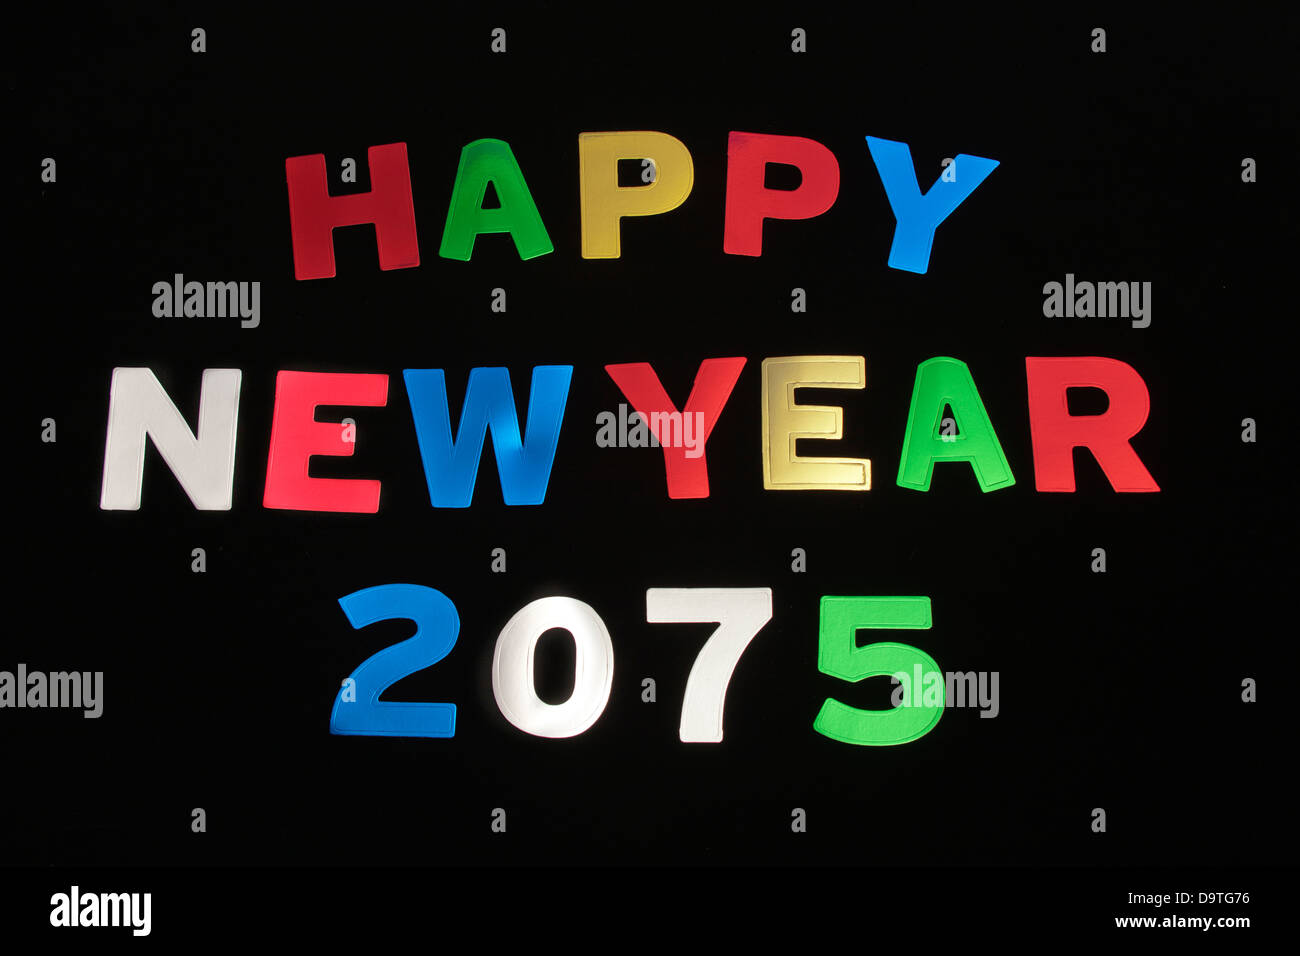 HAPPY NEW YEAR 2075Stock Photo